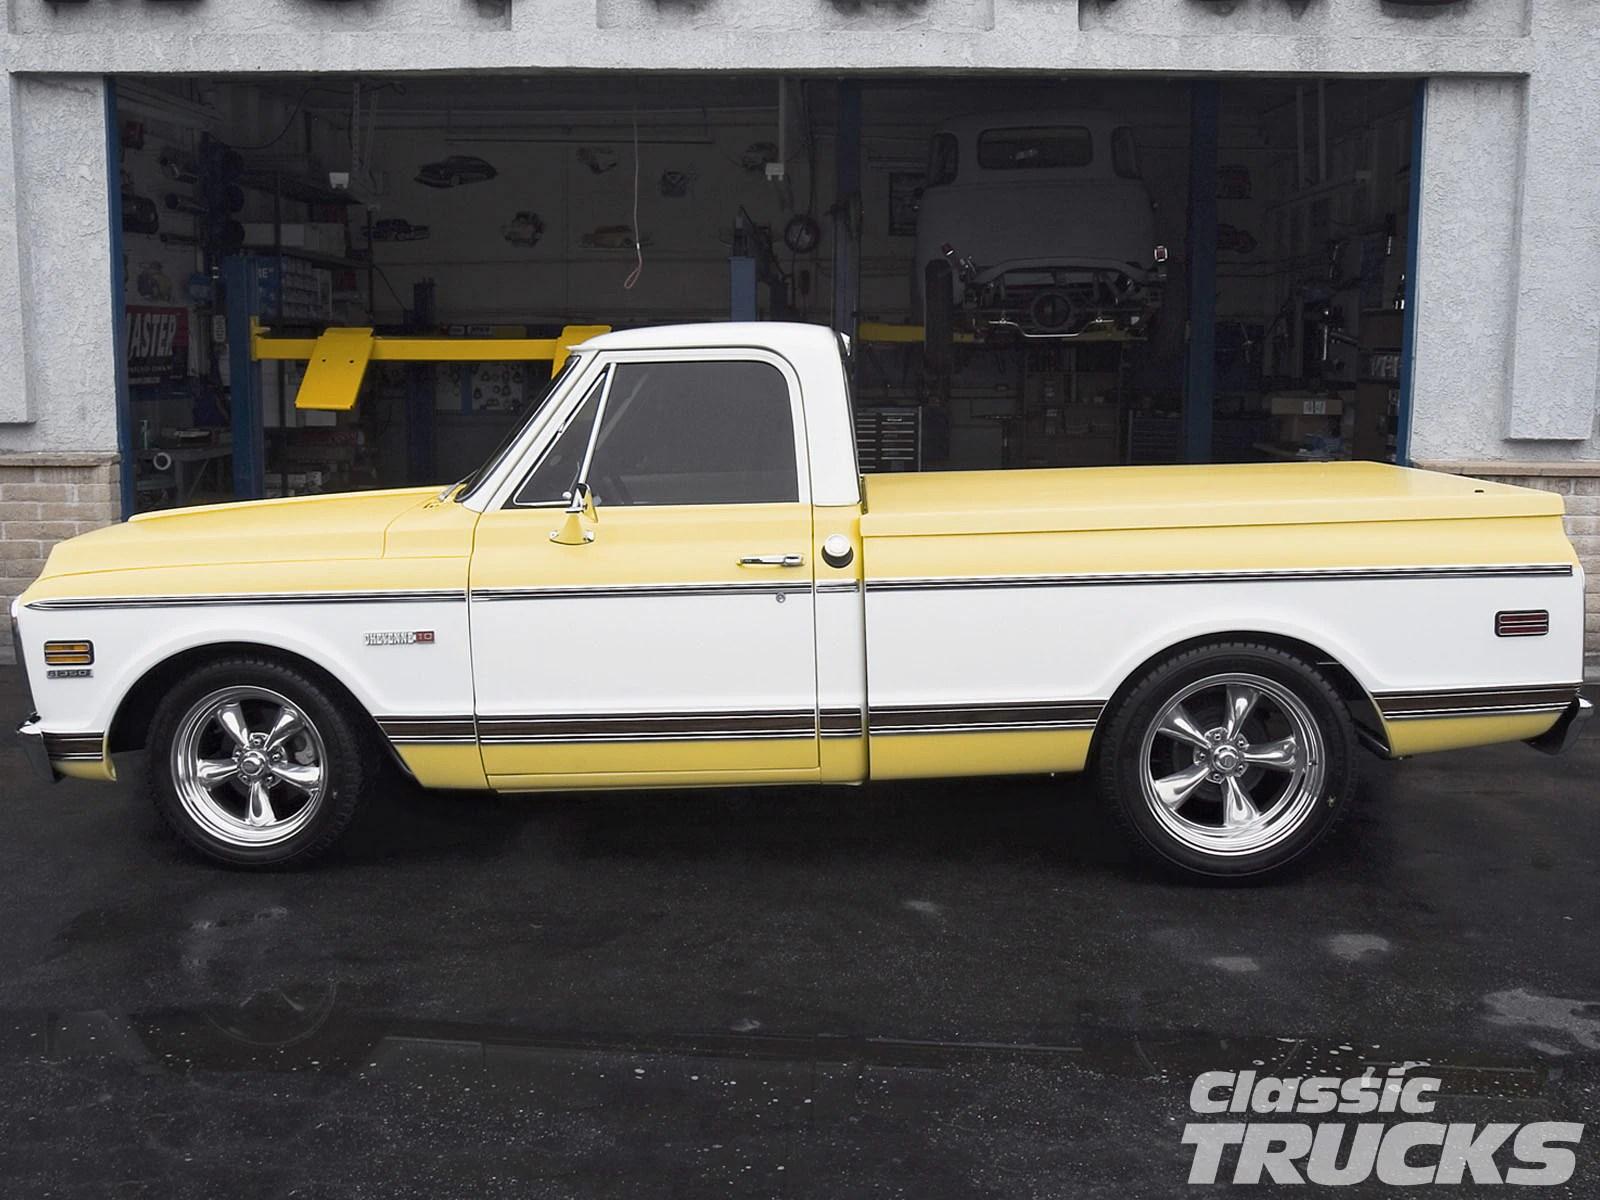 hight resolution of 0612clt 12 o 1971 chevy cheyenne pickup truck side shot